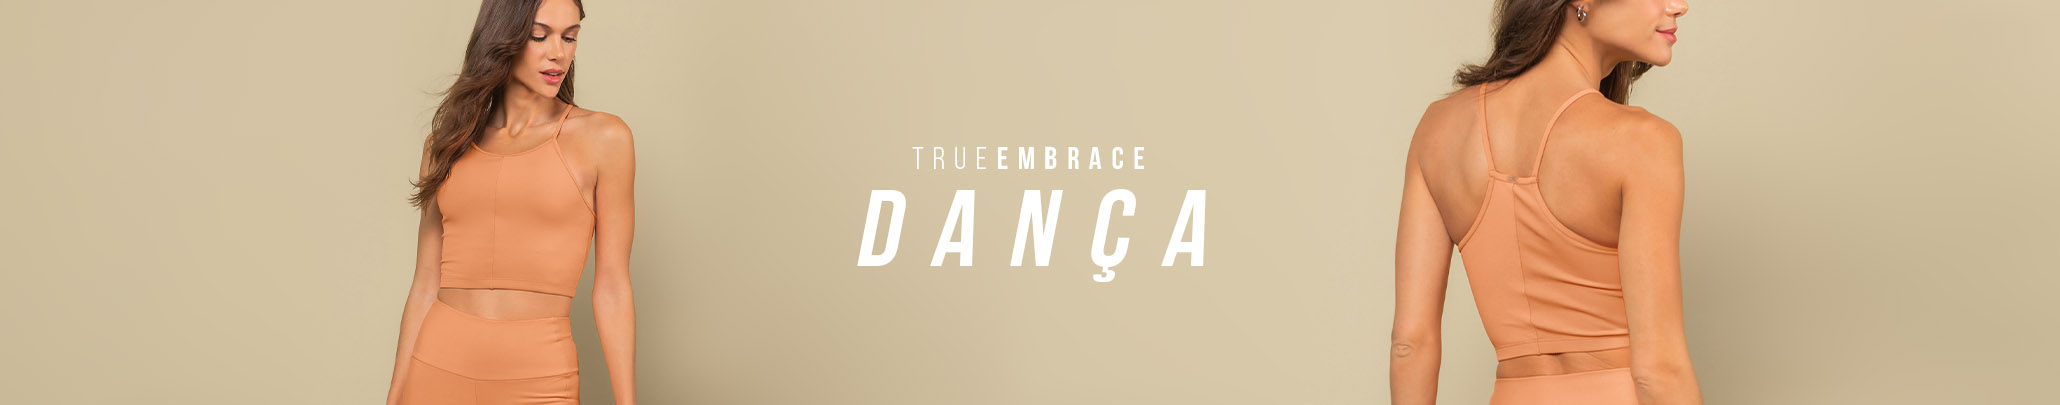 True Embrace Dança